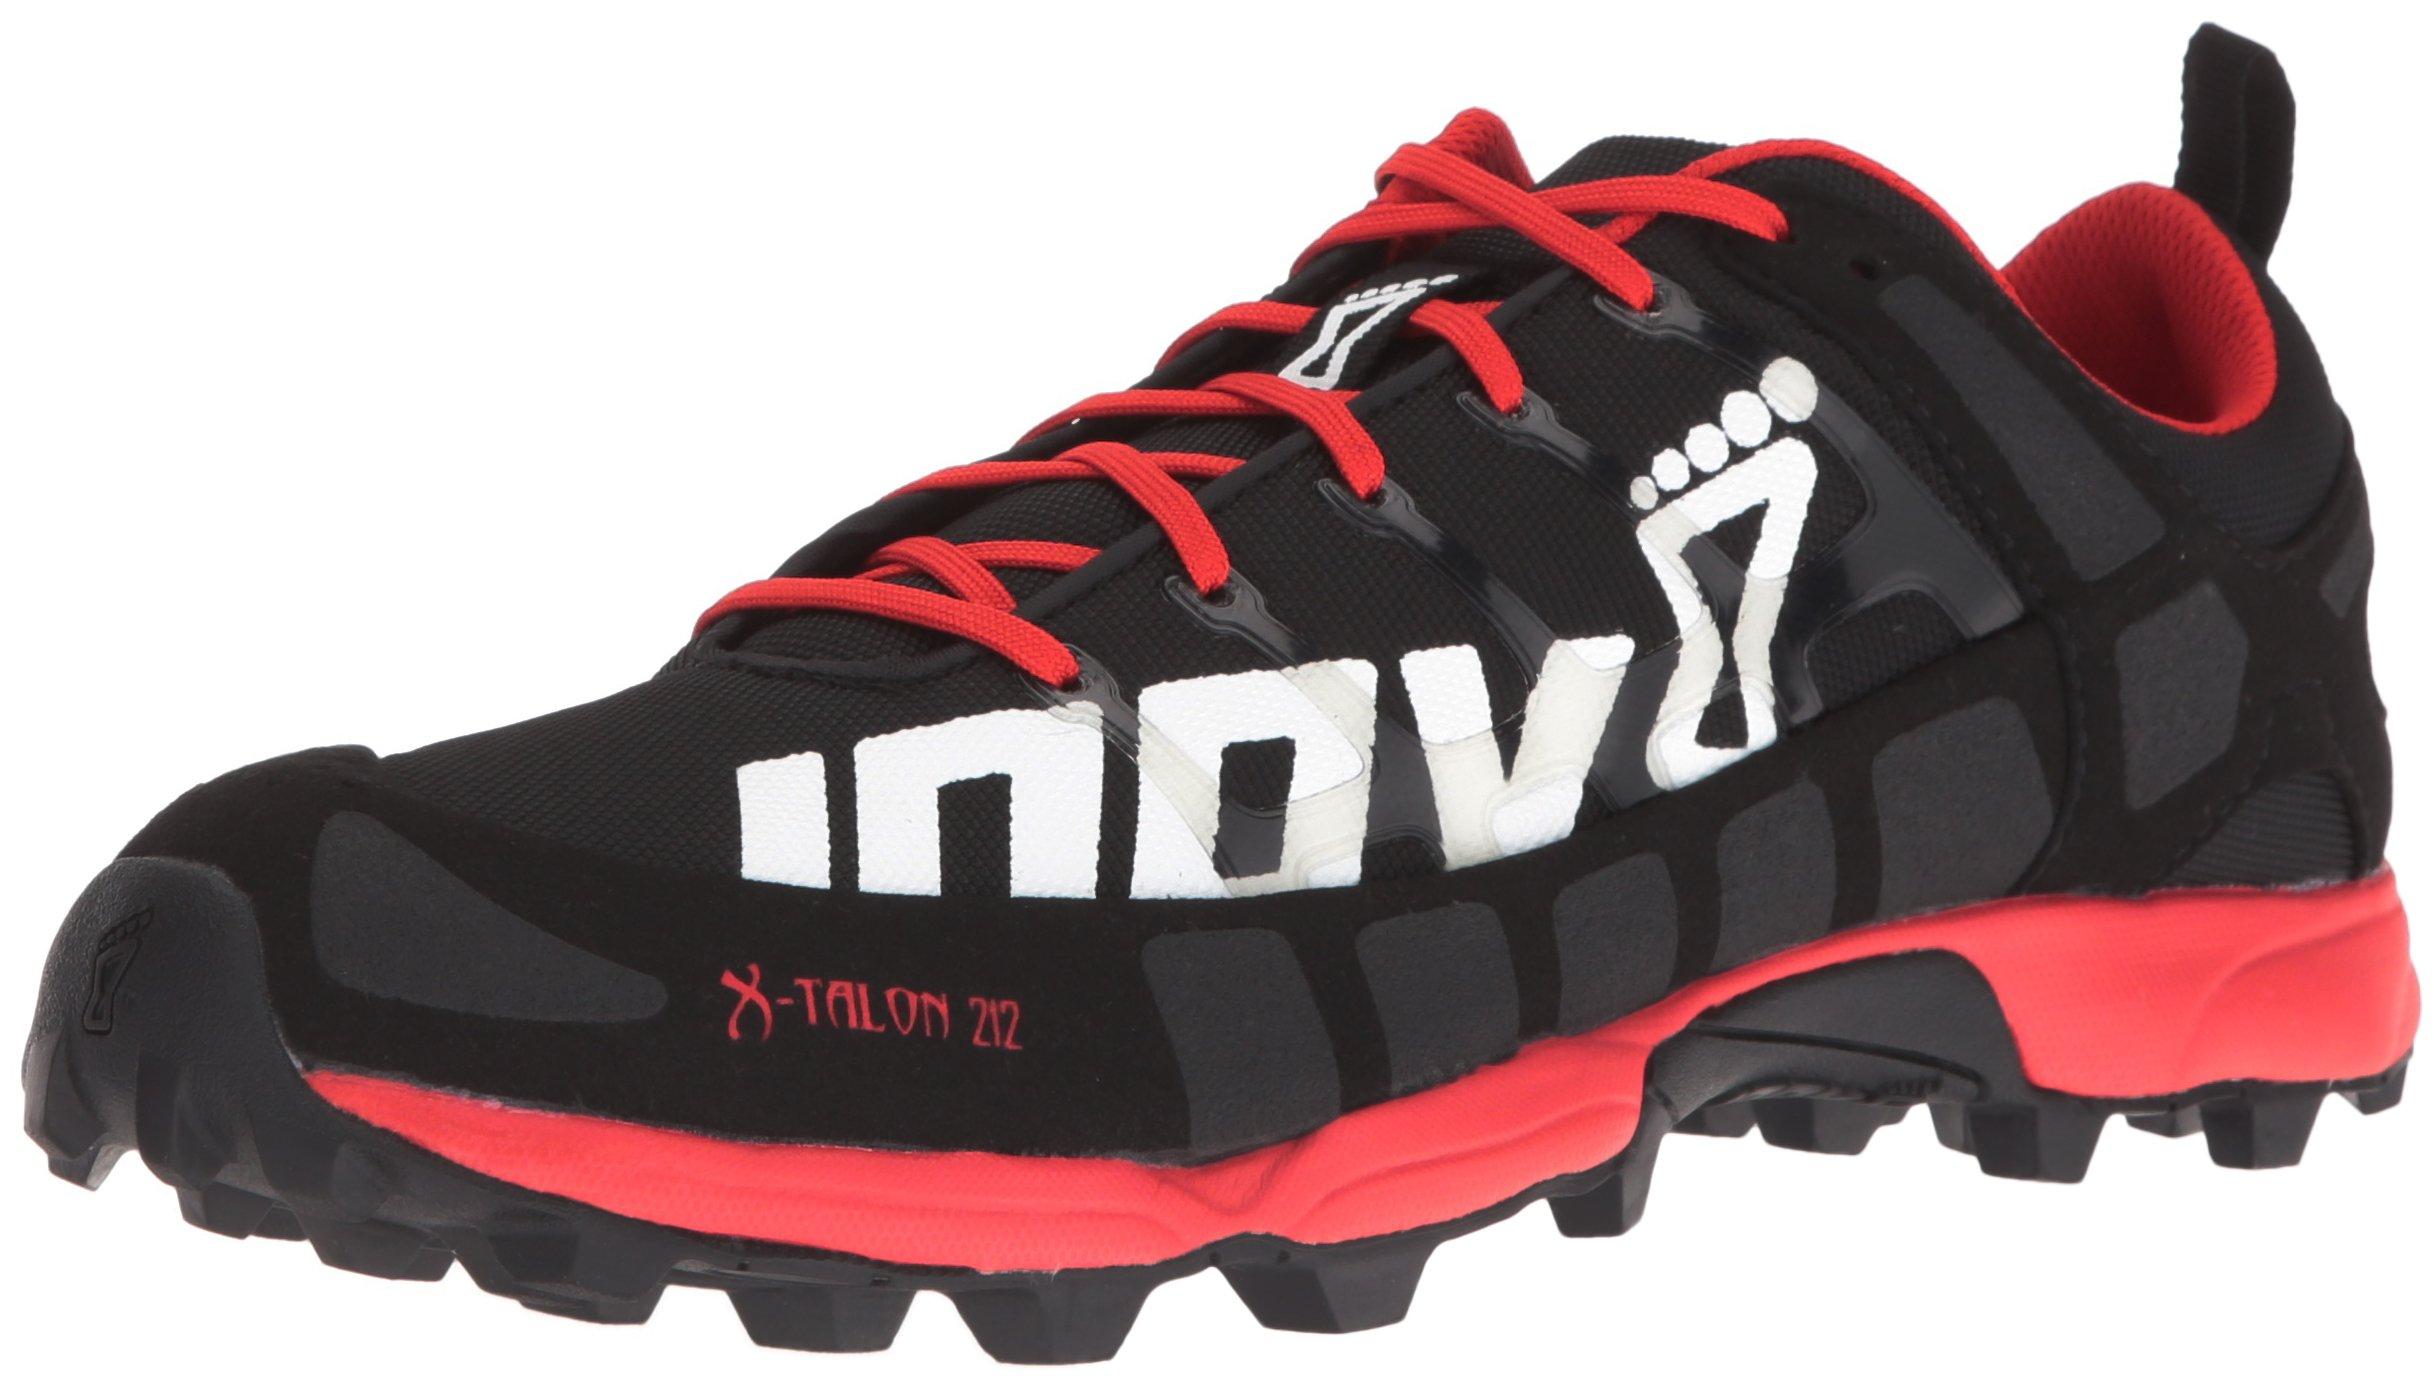 Inov-8 X-Talon 212 Trail Runner, Black/Red, 10 M/11.5 W